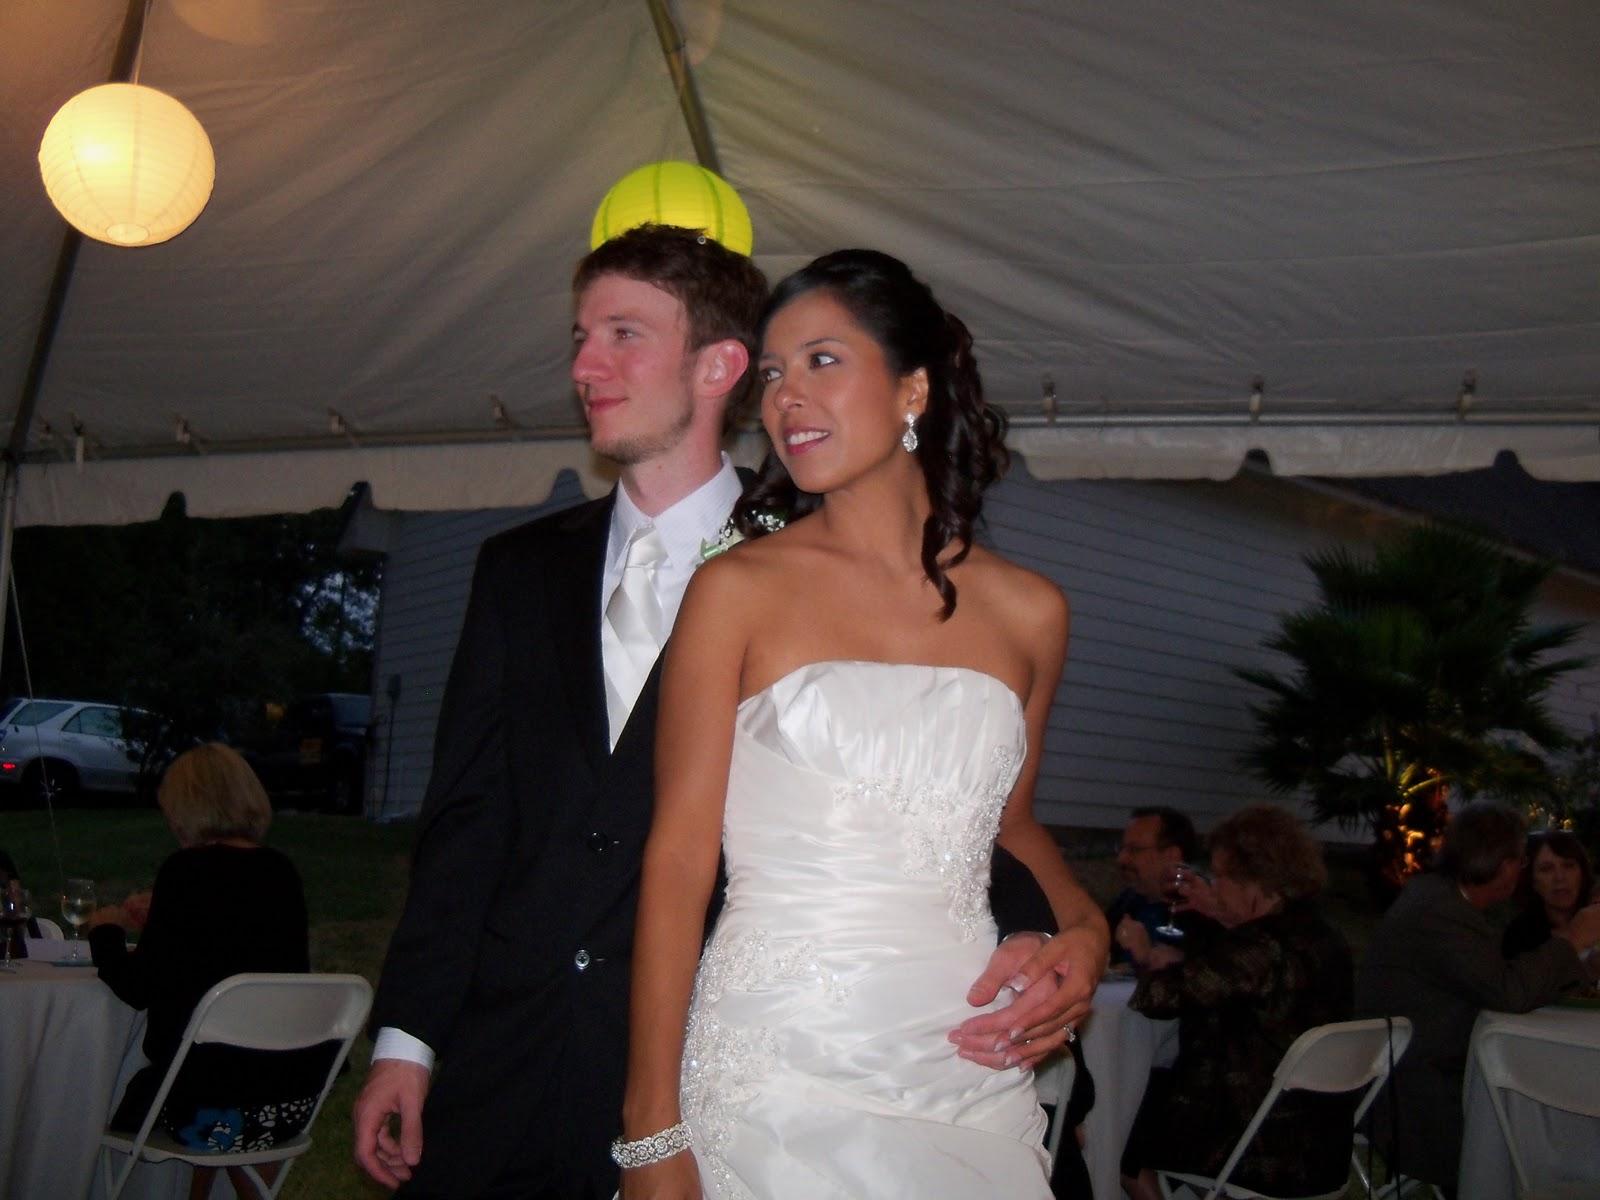 Ben and Jessica Coons wedding - 115_0848.JPG